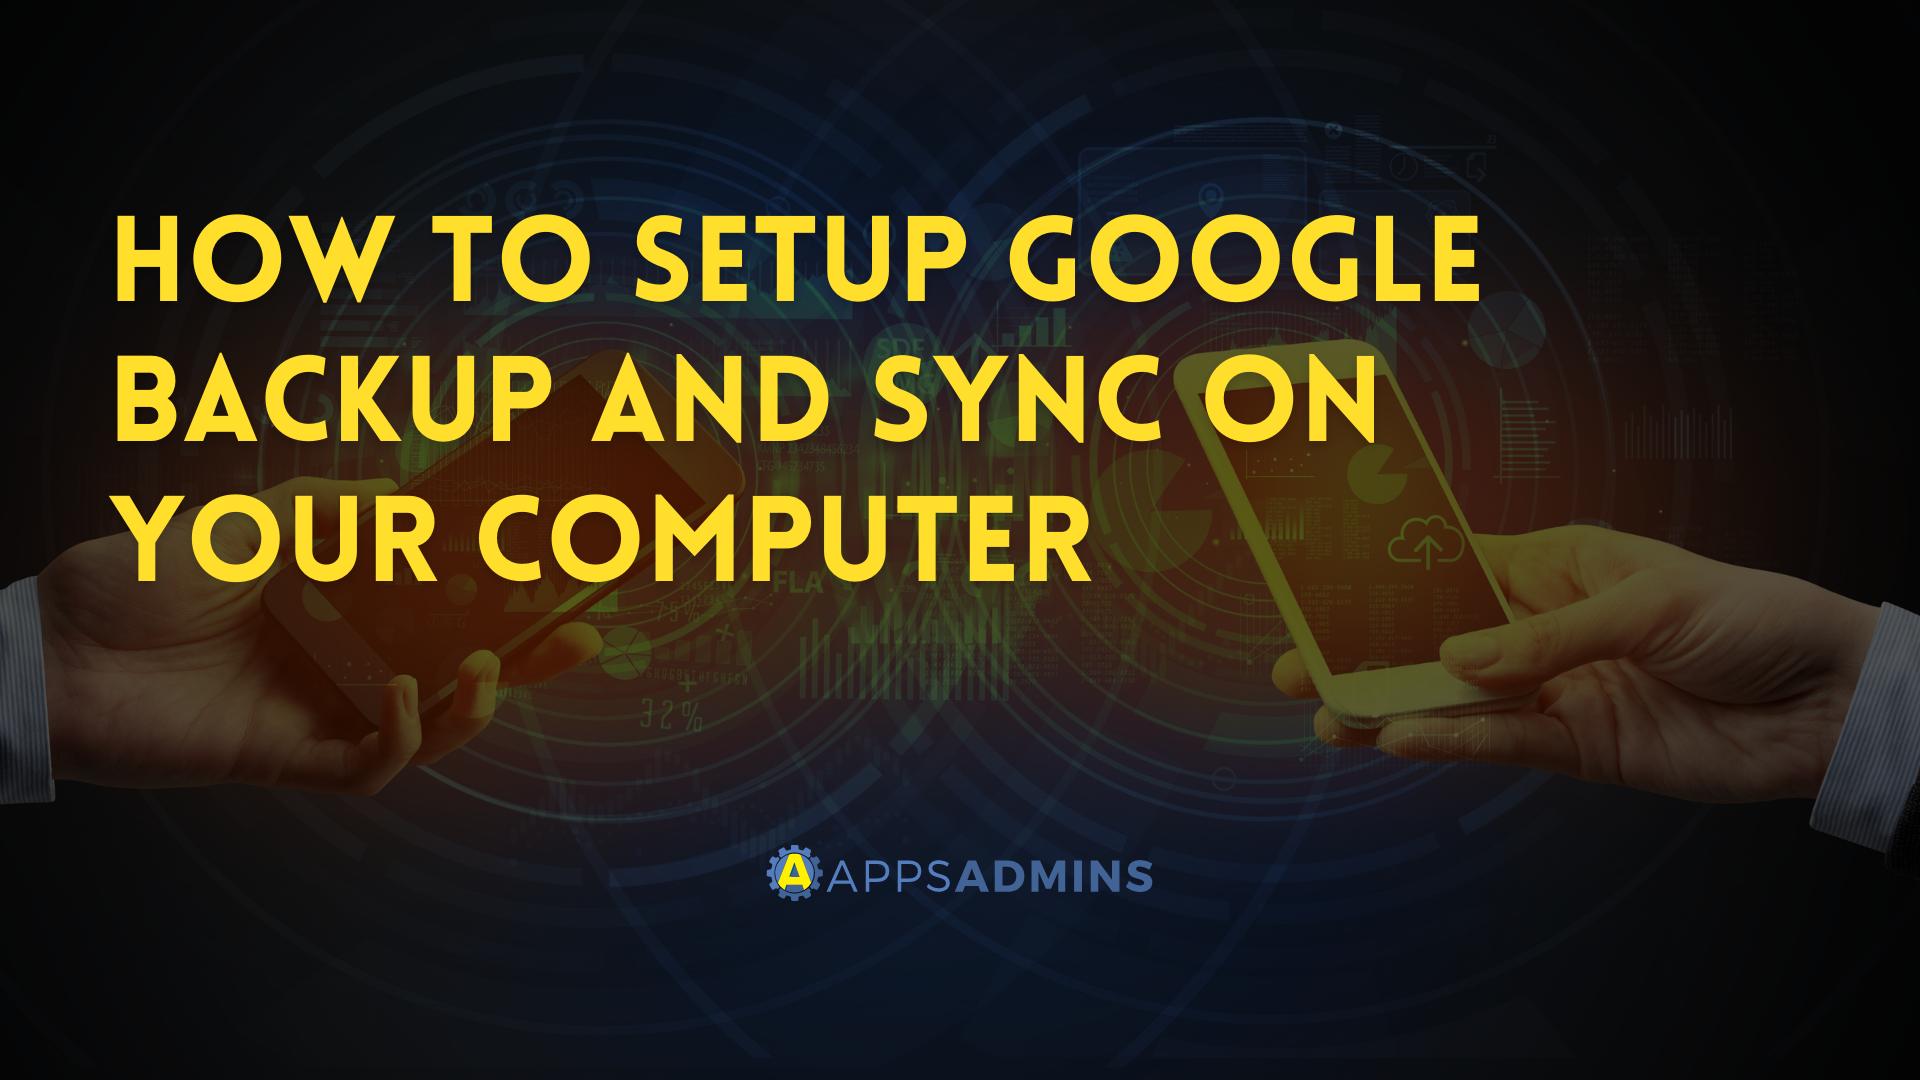 How to setup Google Backup and Sync on your computer